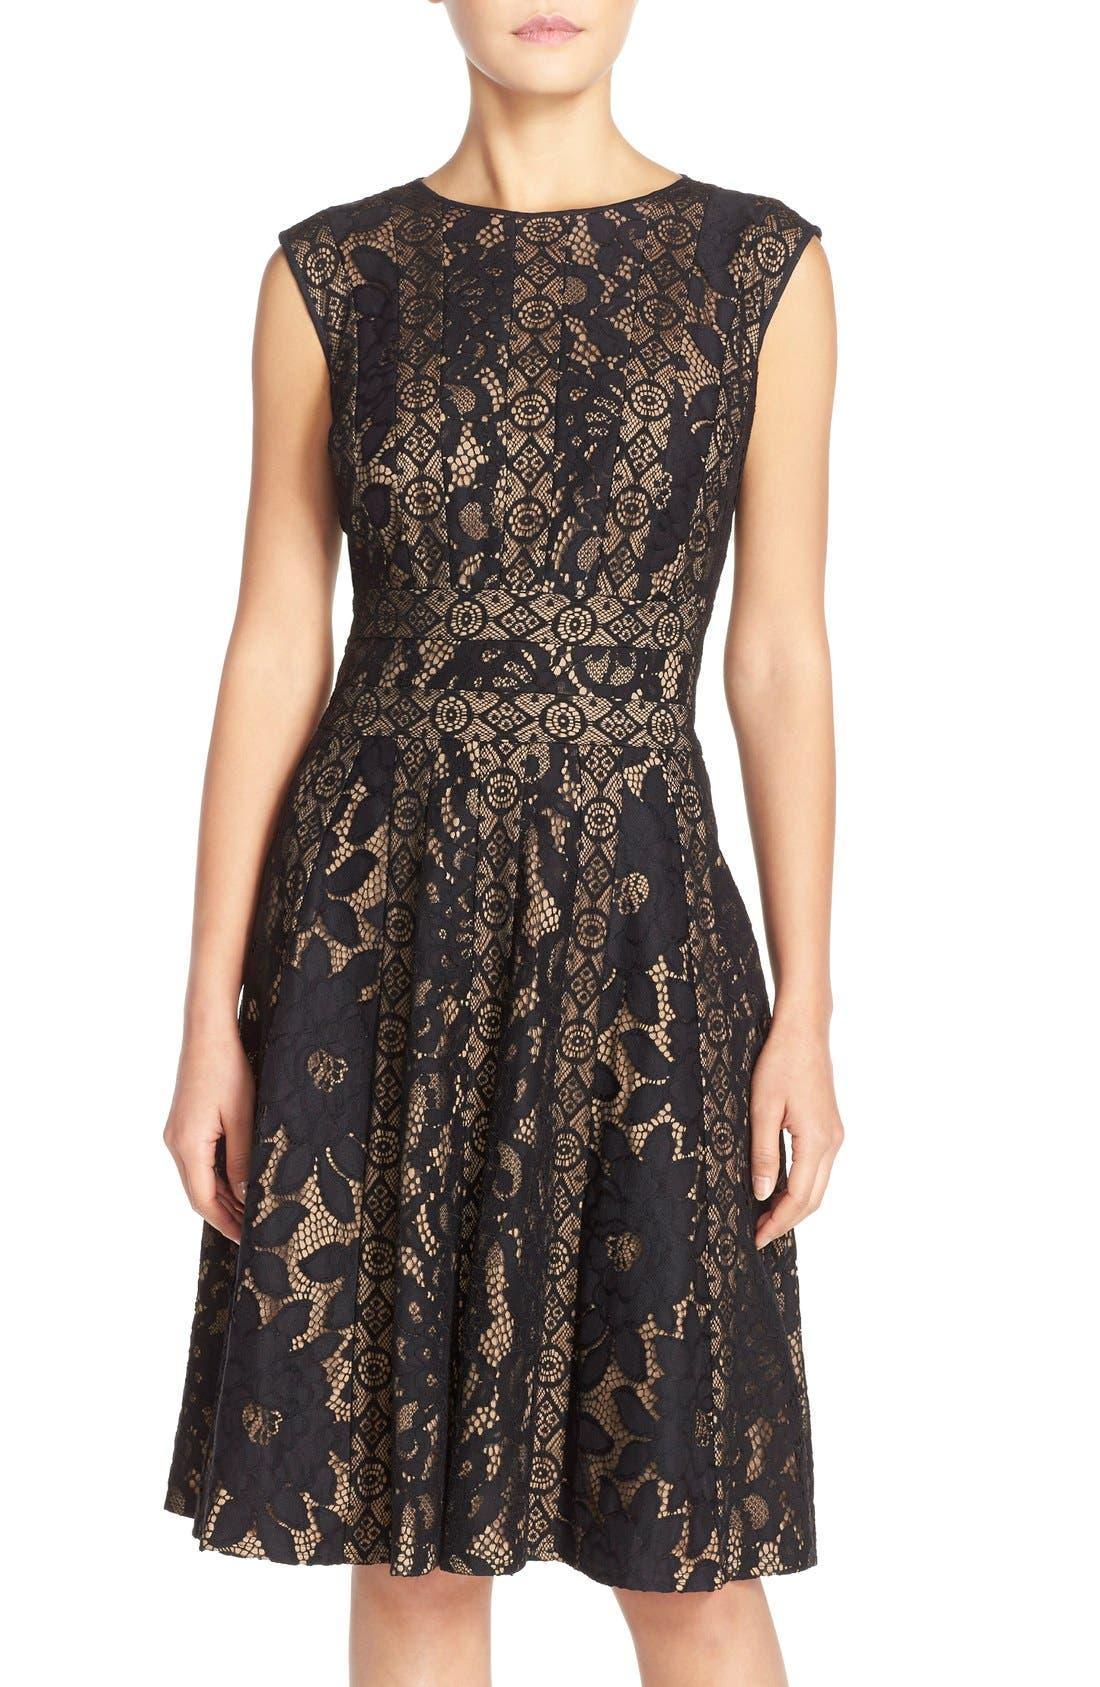 Alternate Image 1 Selected - Tadashi Shoji Mixed Lace Fit & Flare Dress